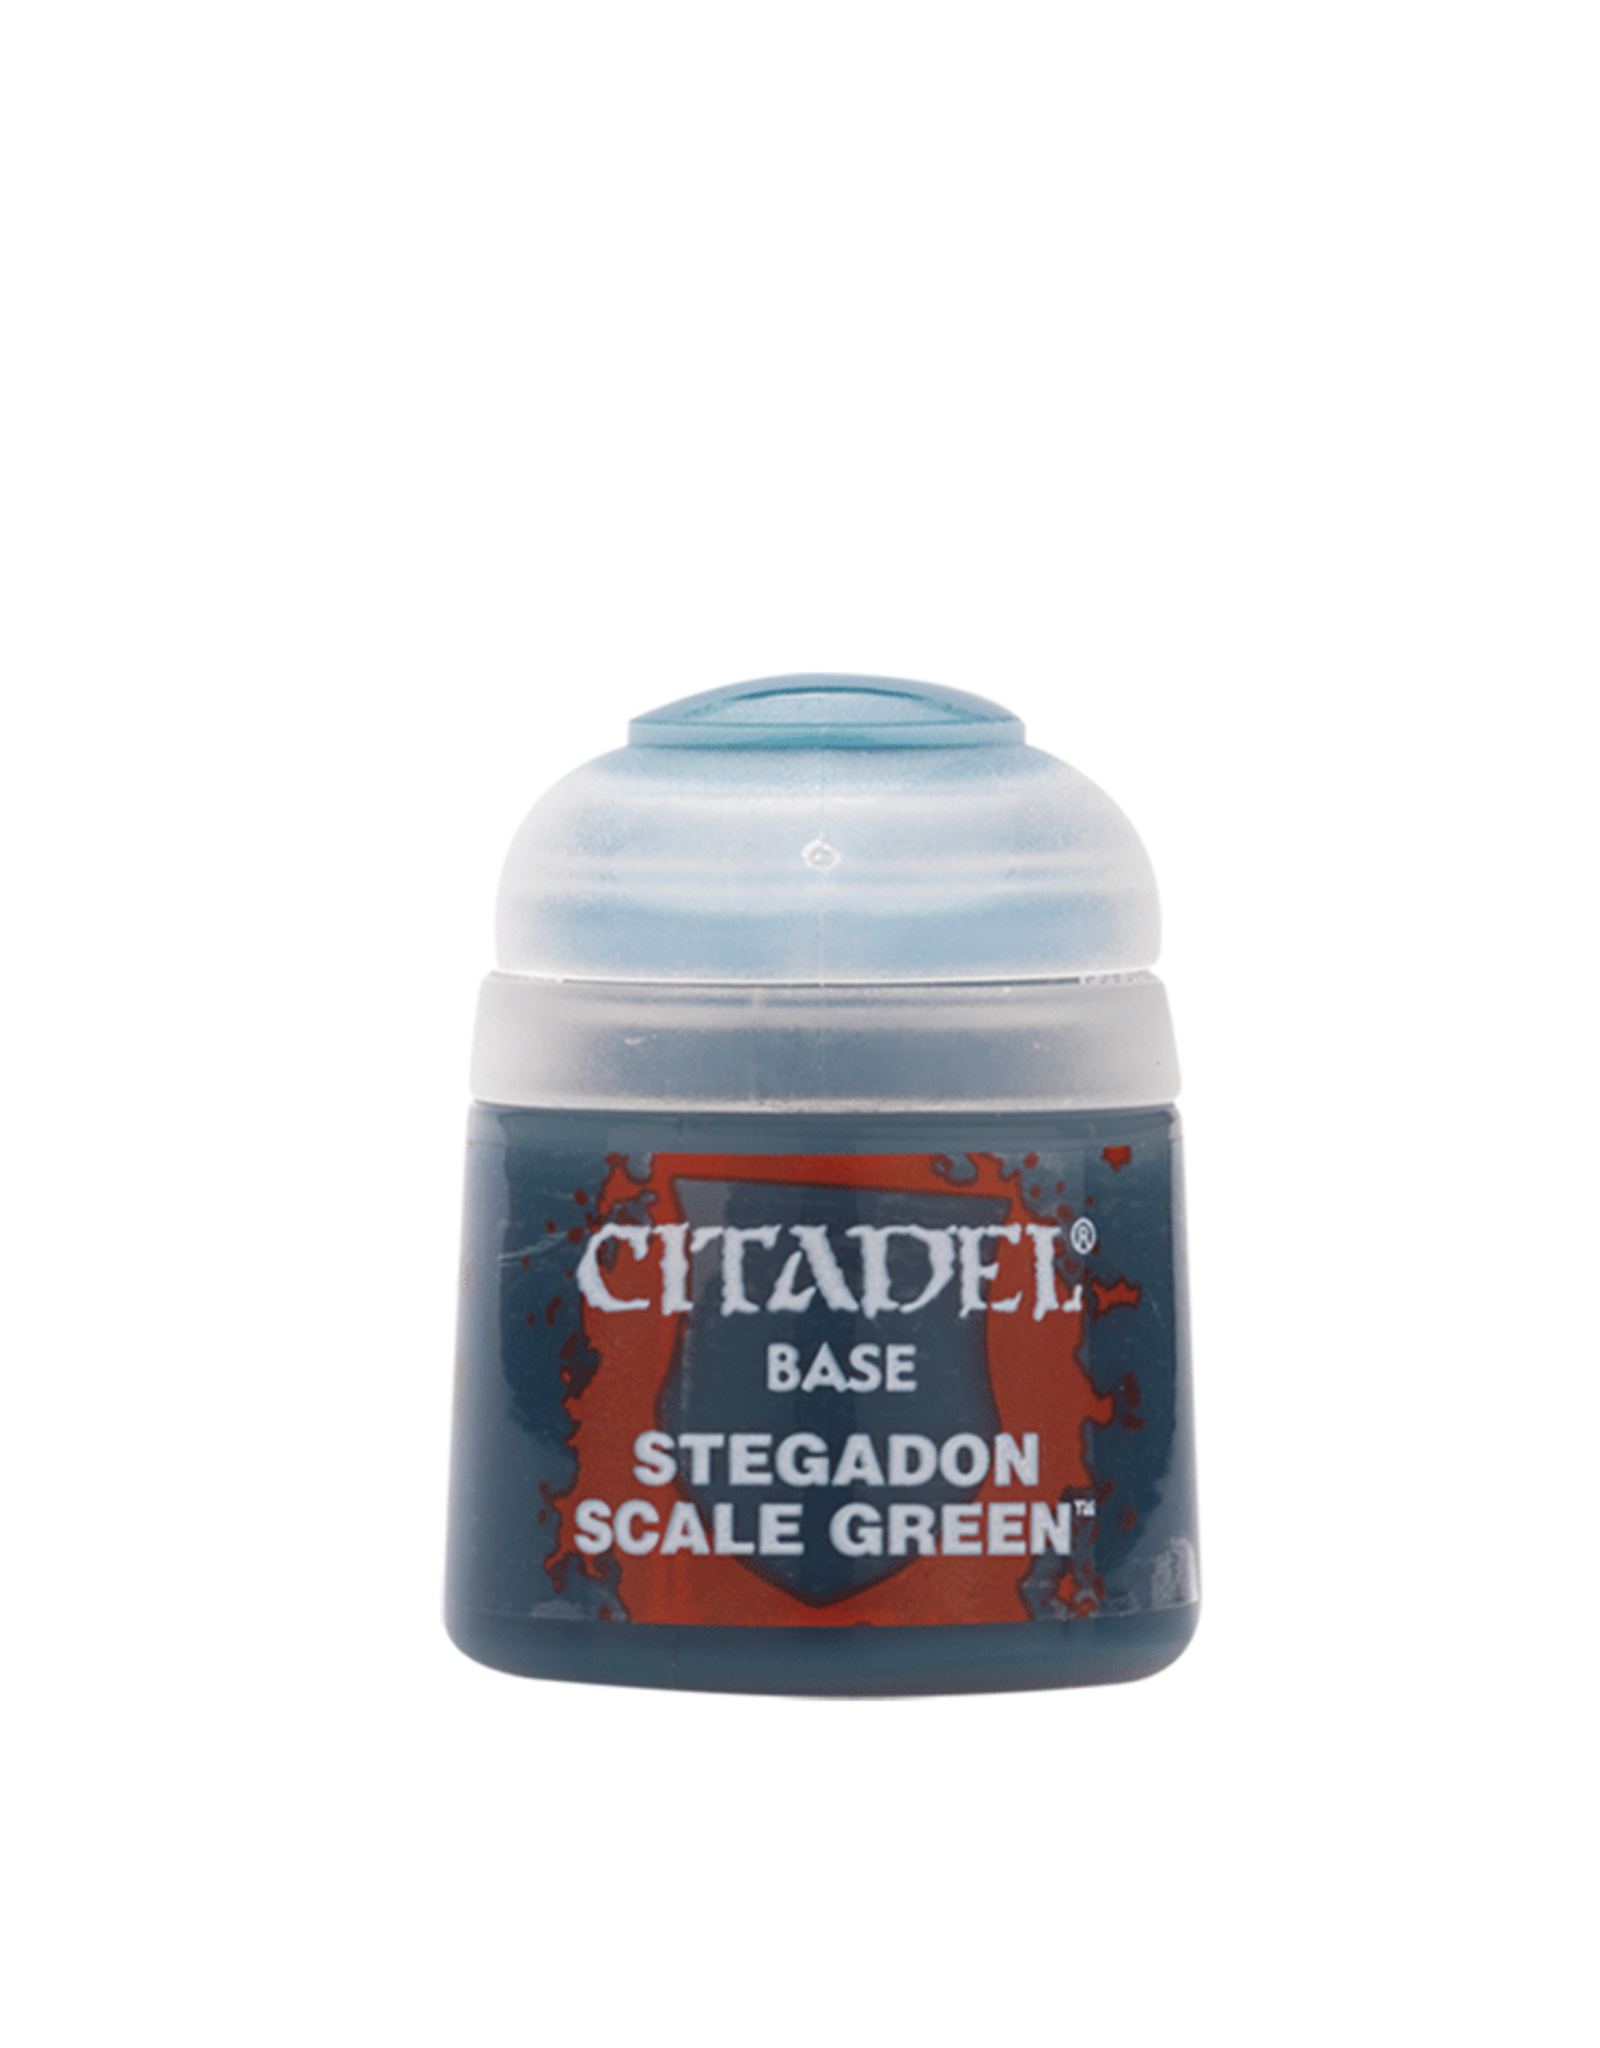 Citadel Citadel Base: Stegadon Scale Green (12ml)